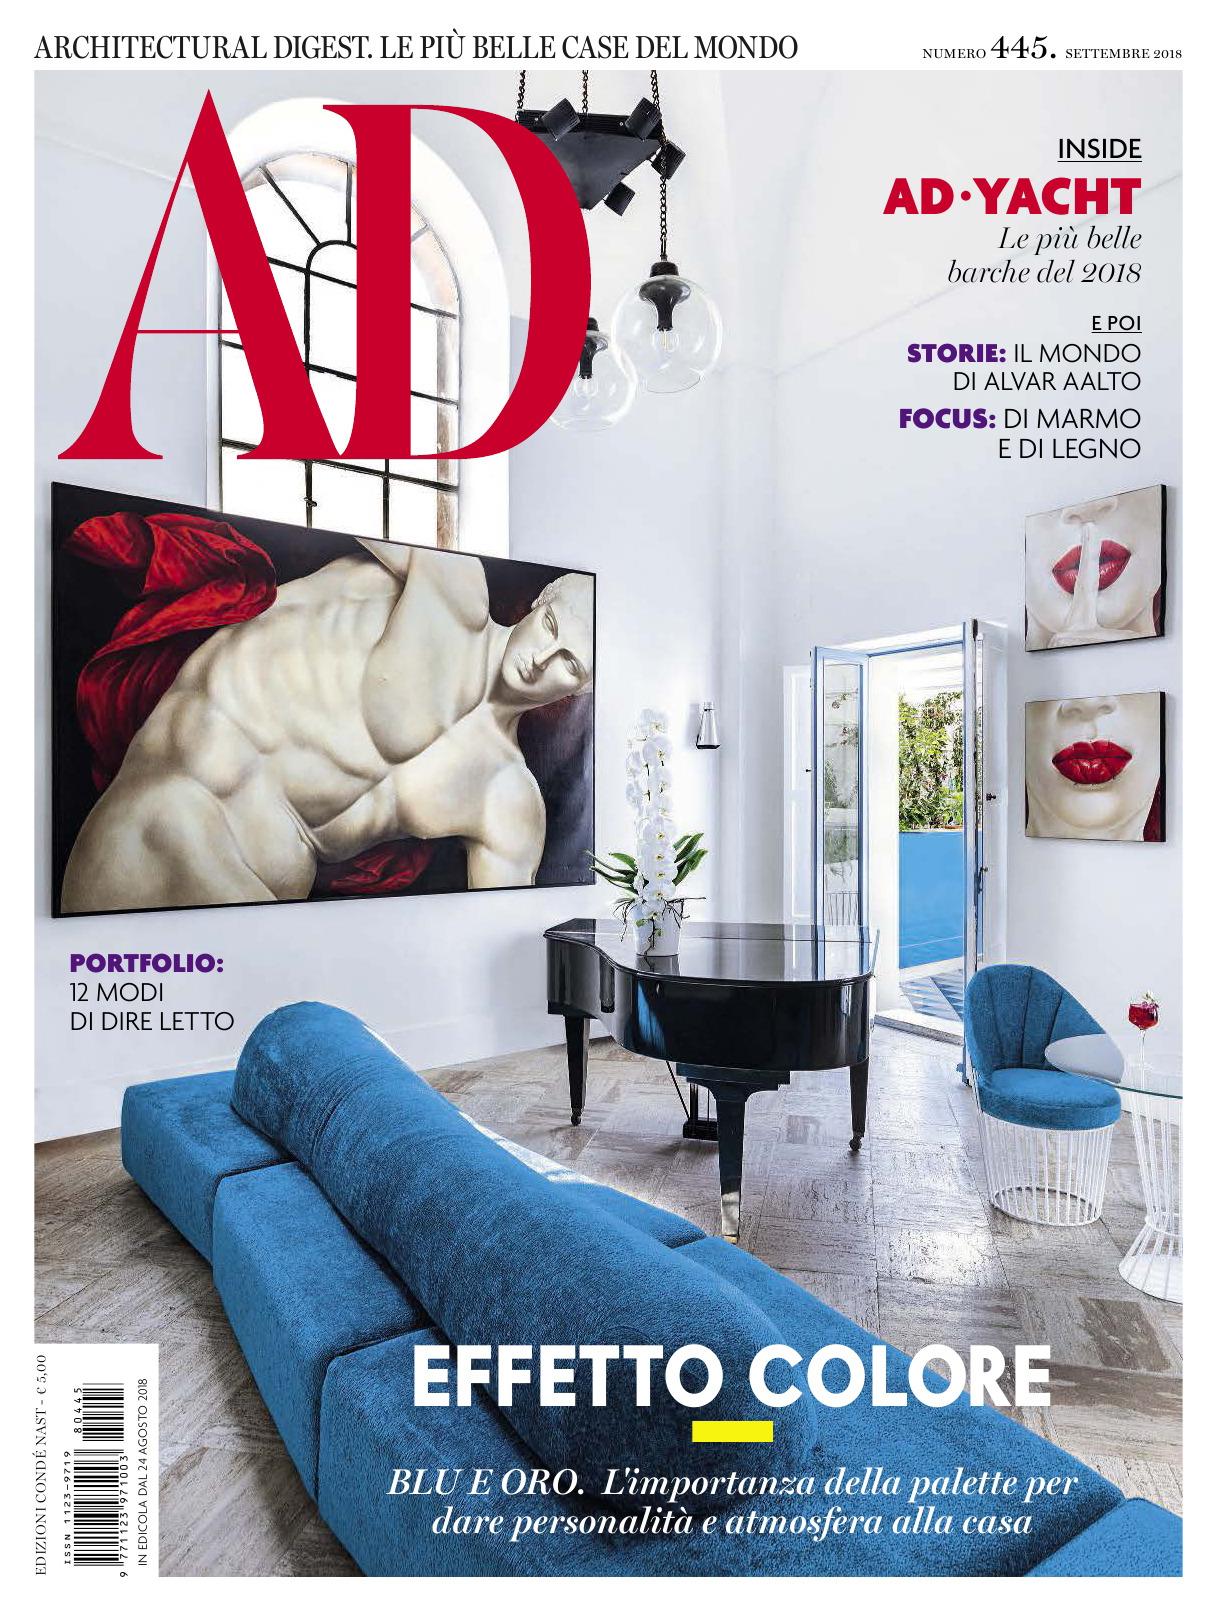 《AD》意大利版室内室外设计杂志2018年09月号